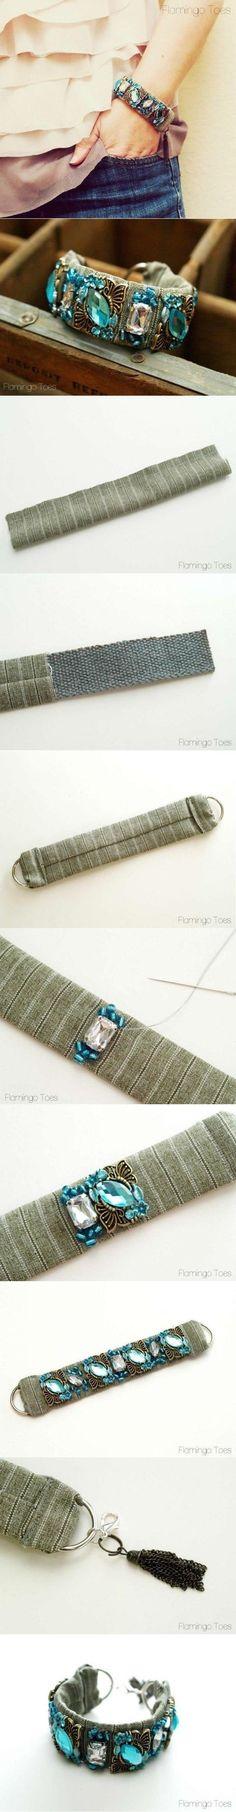 DIY Beautiful Handmade Wristband DIY Projects | UsefulDIY.com  Follow Us on Facebook ==> http://www.facebook.com/UsefulDiy